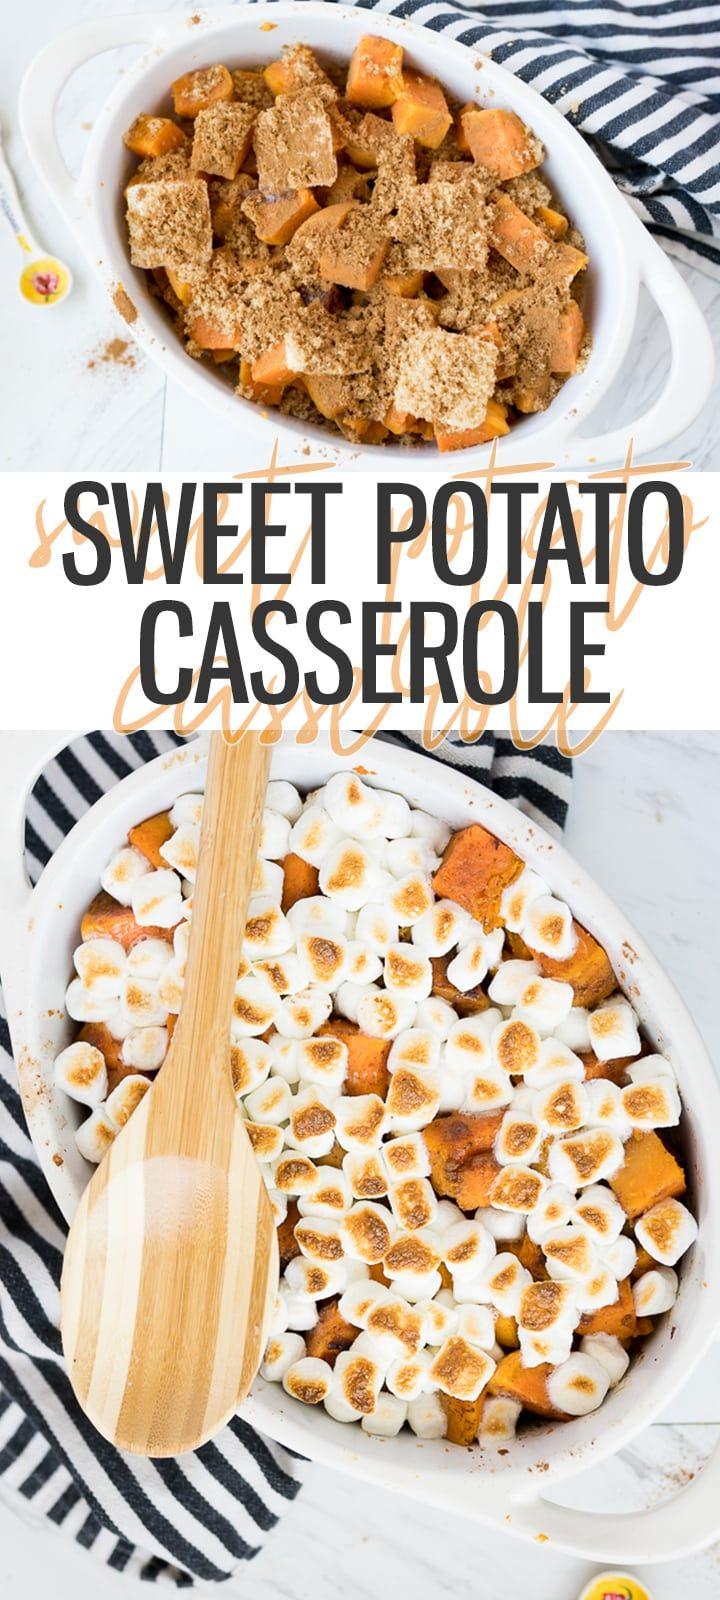 Easy Sweet Potato Casserole - Cooking With Karli #sweetpotatocasserole